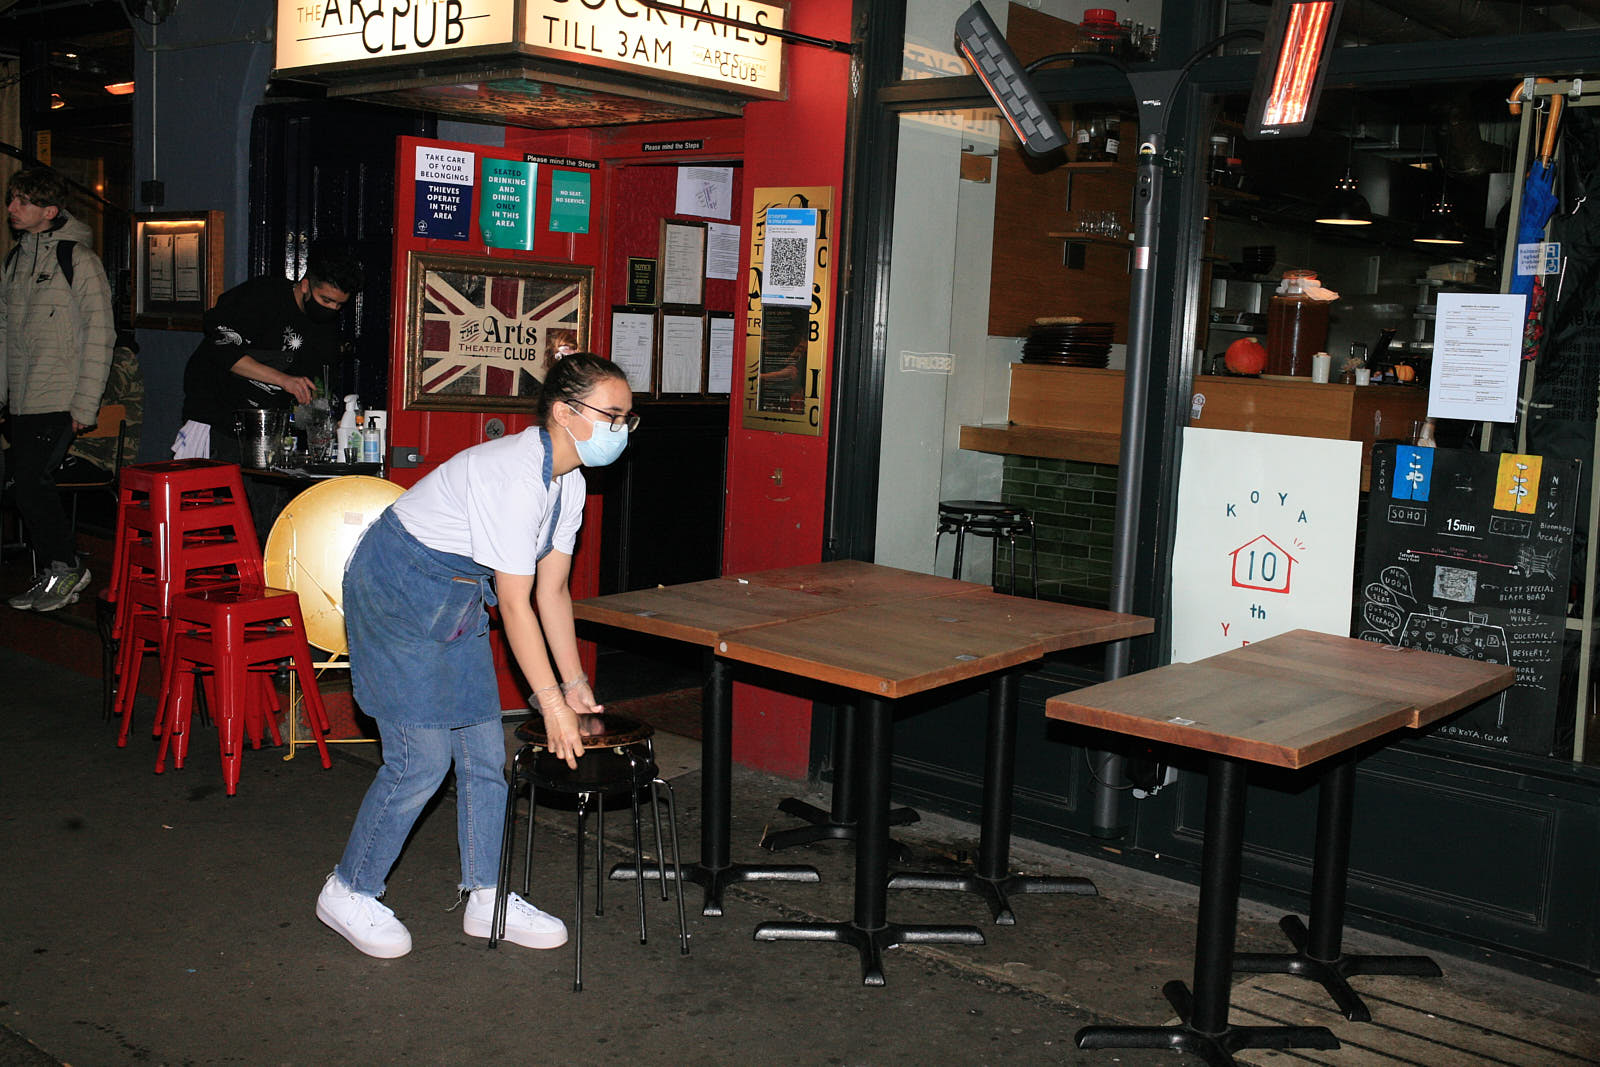 A staff member in a mask moves tables outside Koya restaurant in Soho